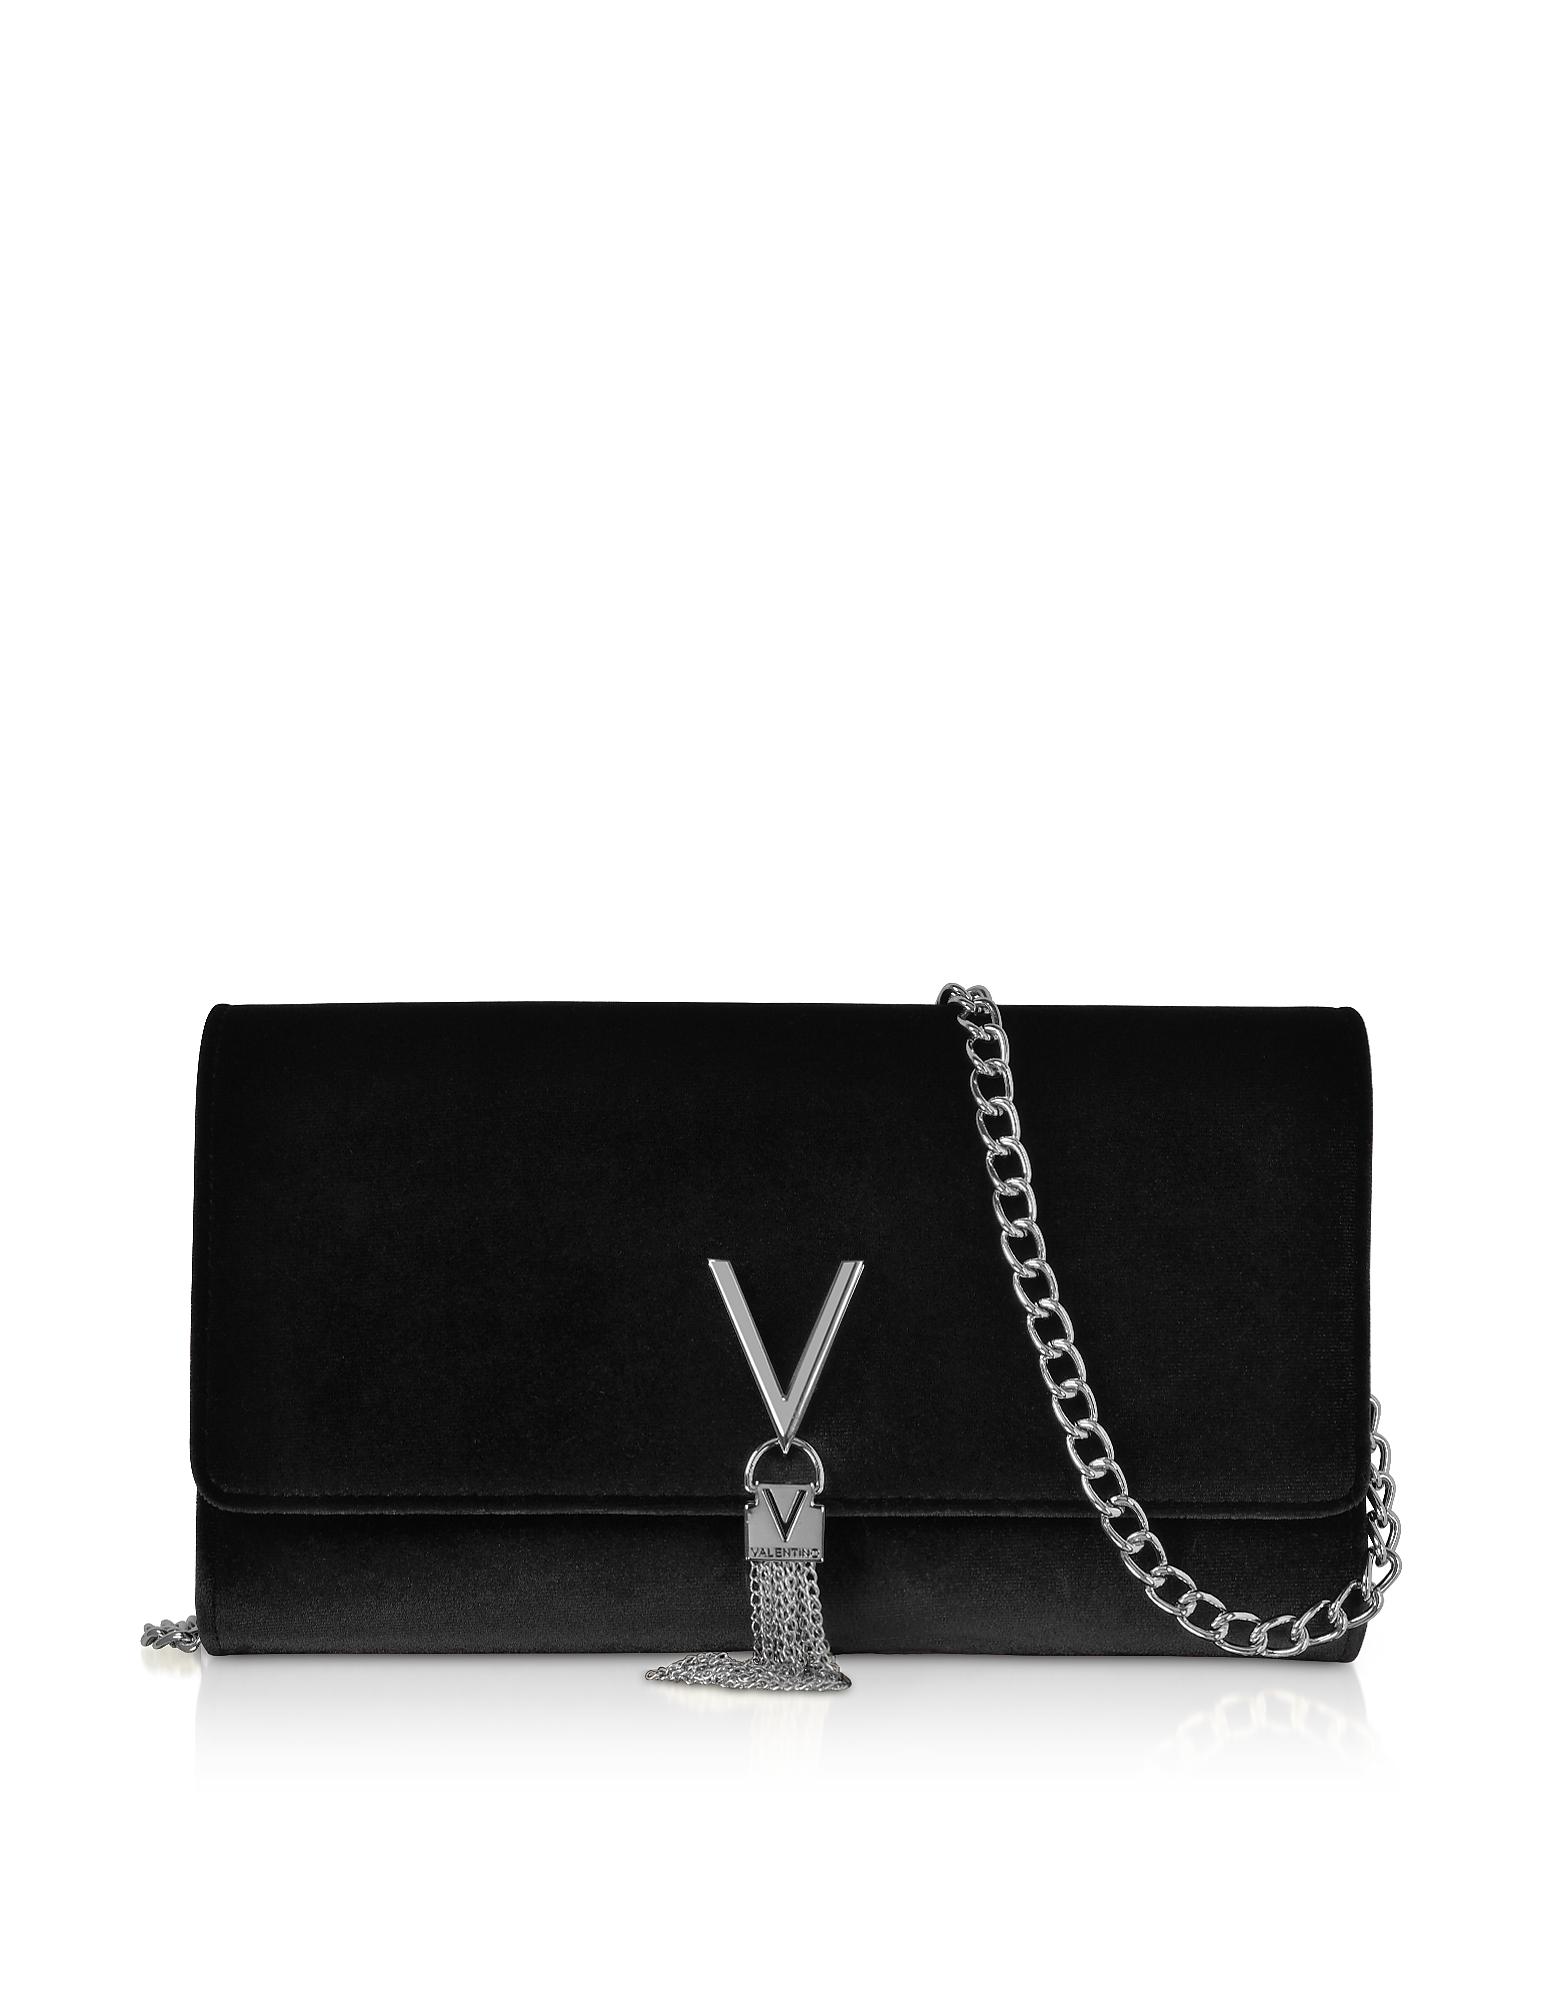 Black Velvet Marilyn Shoulder Bag